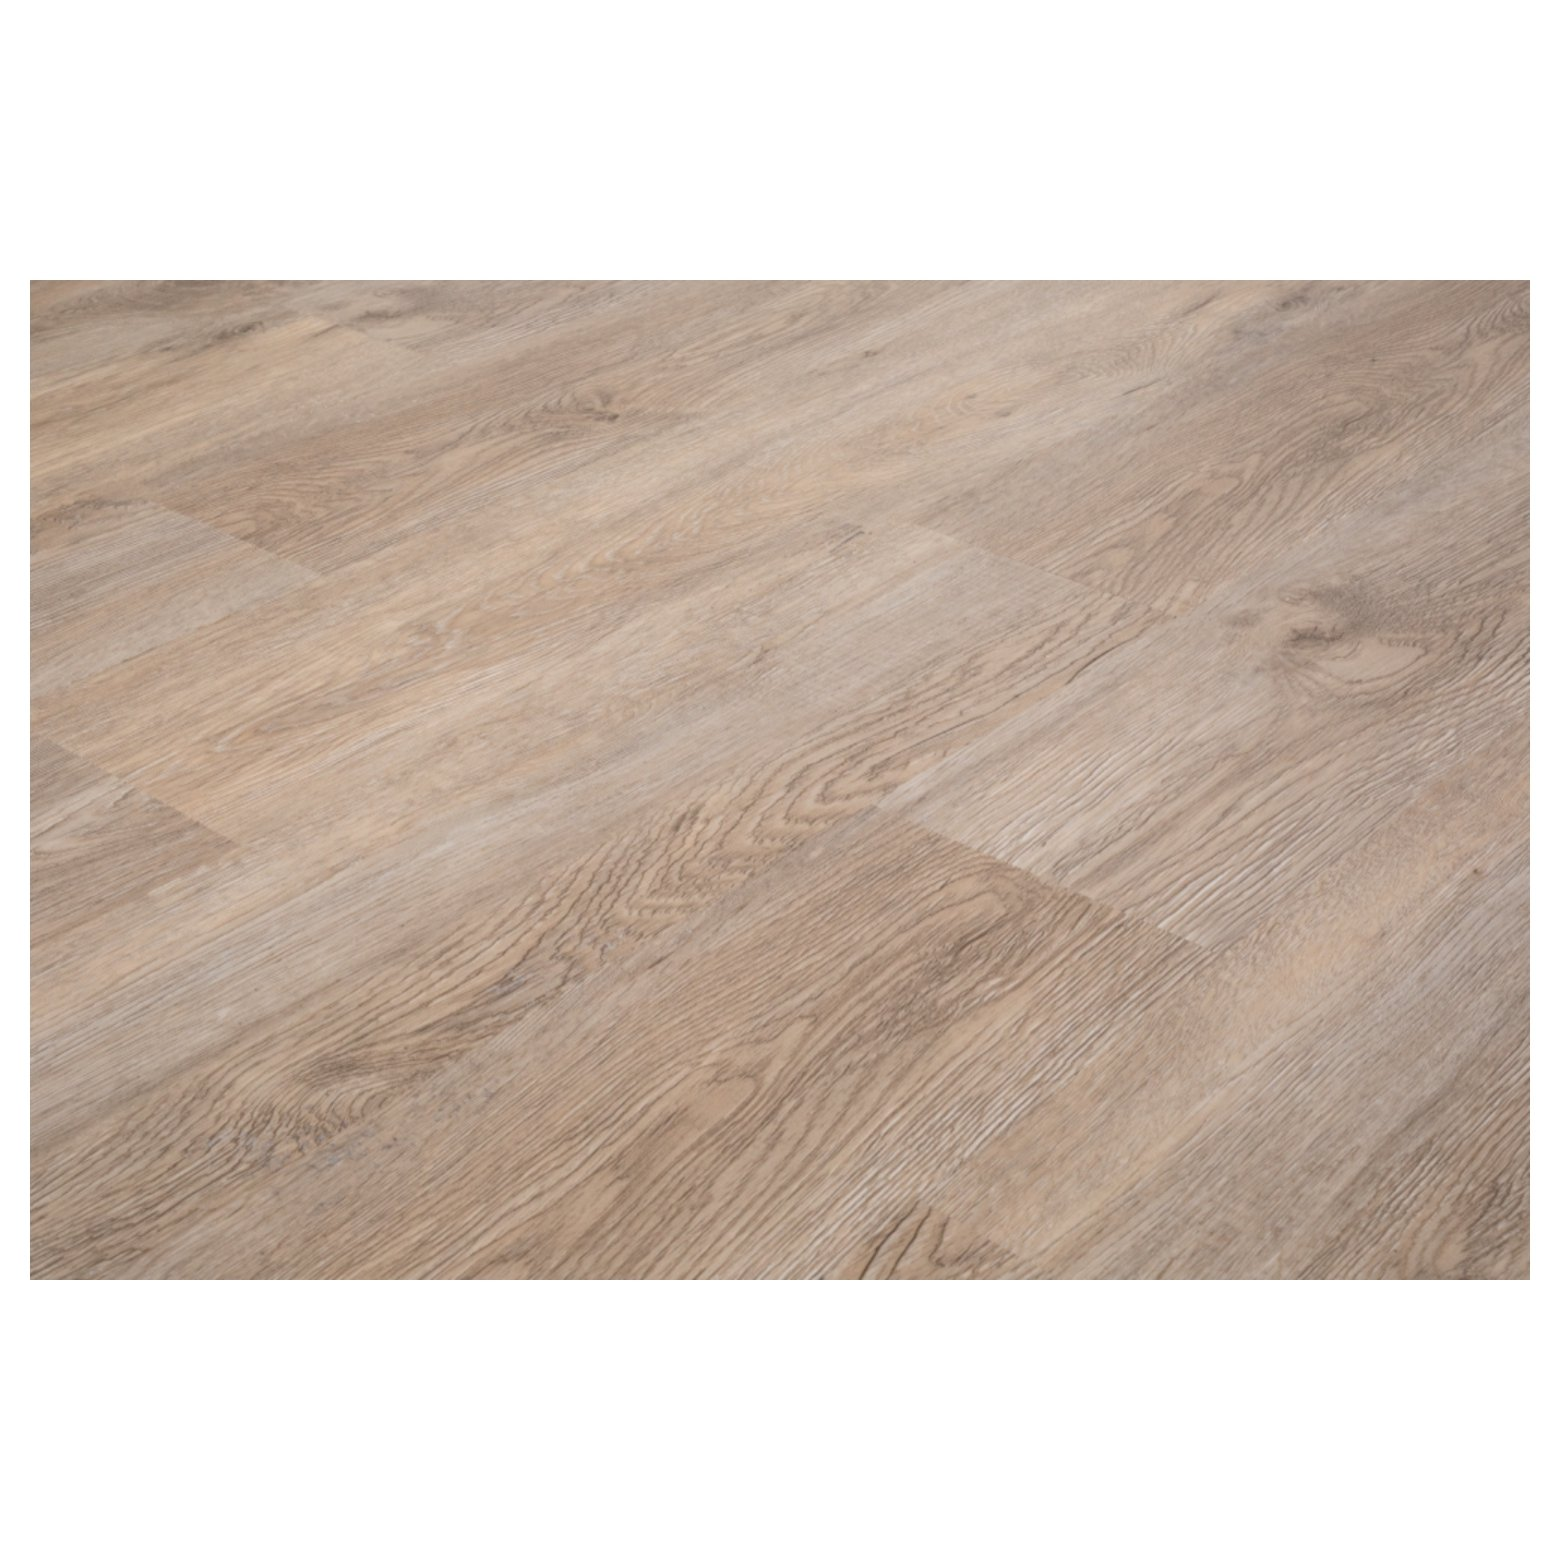 Podłoga winylowa WPW Aurora Oak